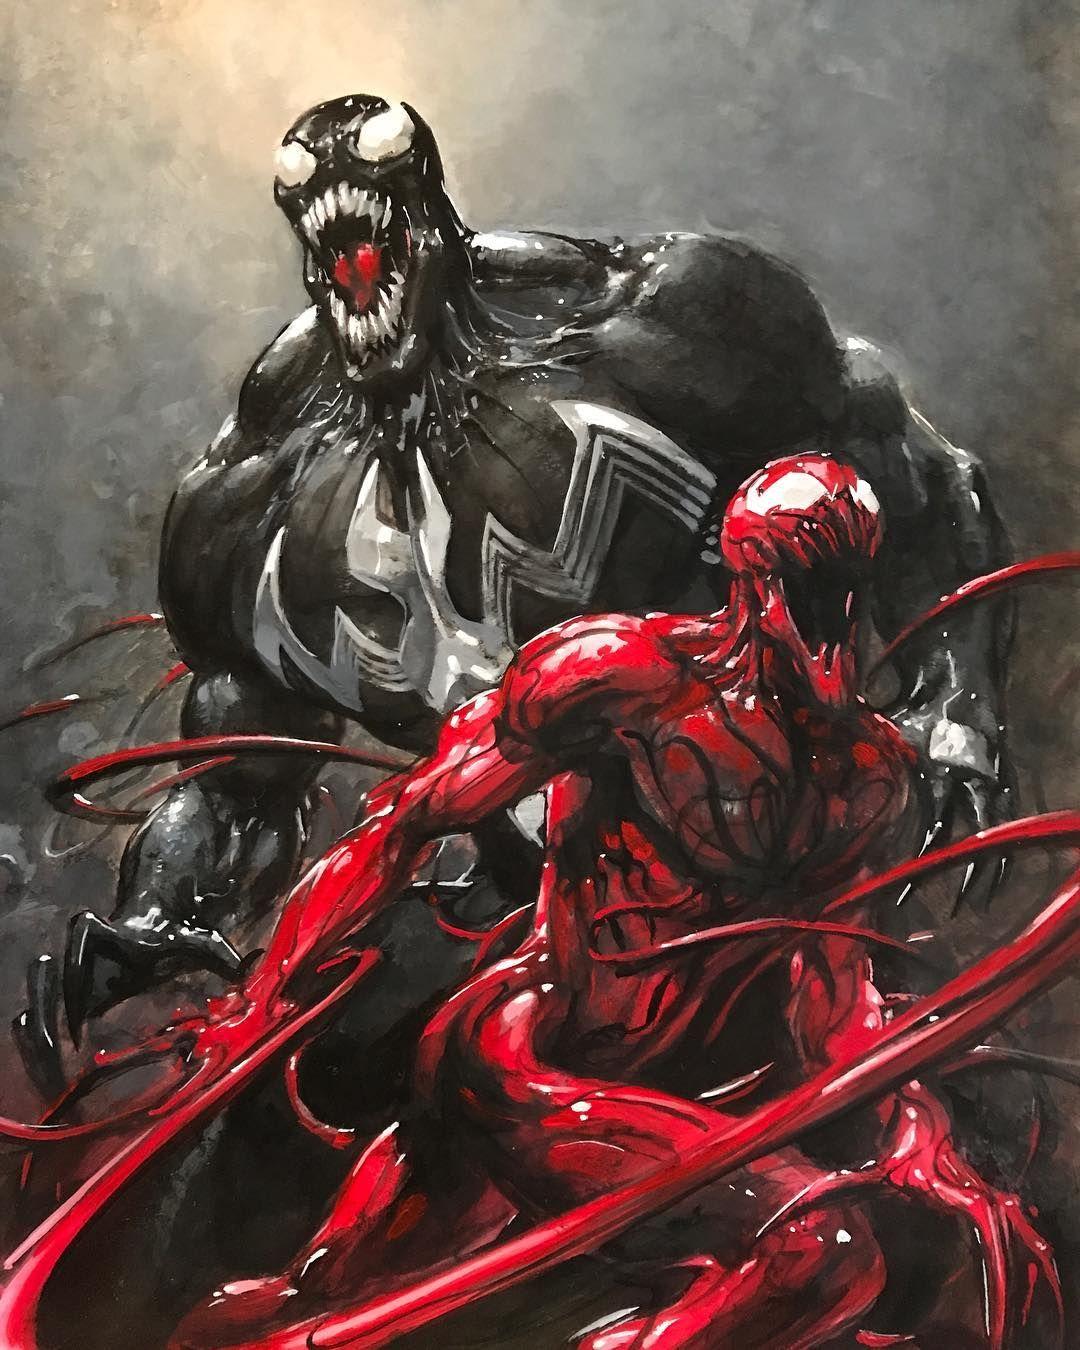 carnage and venom relationship